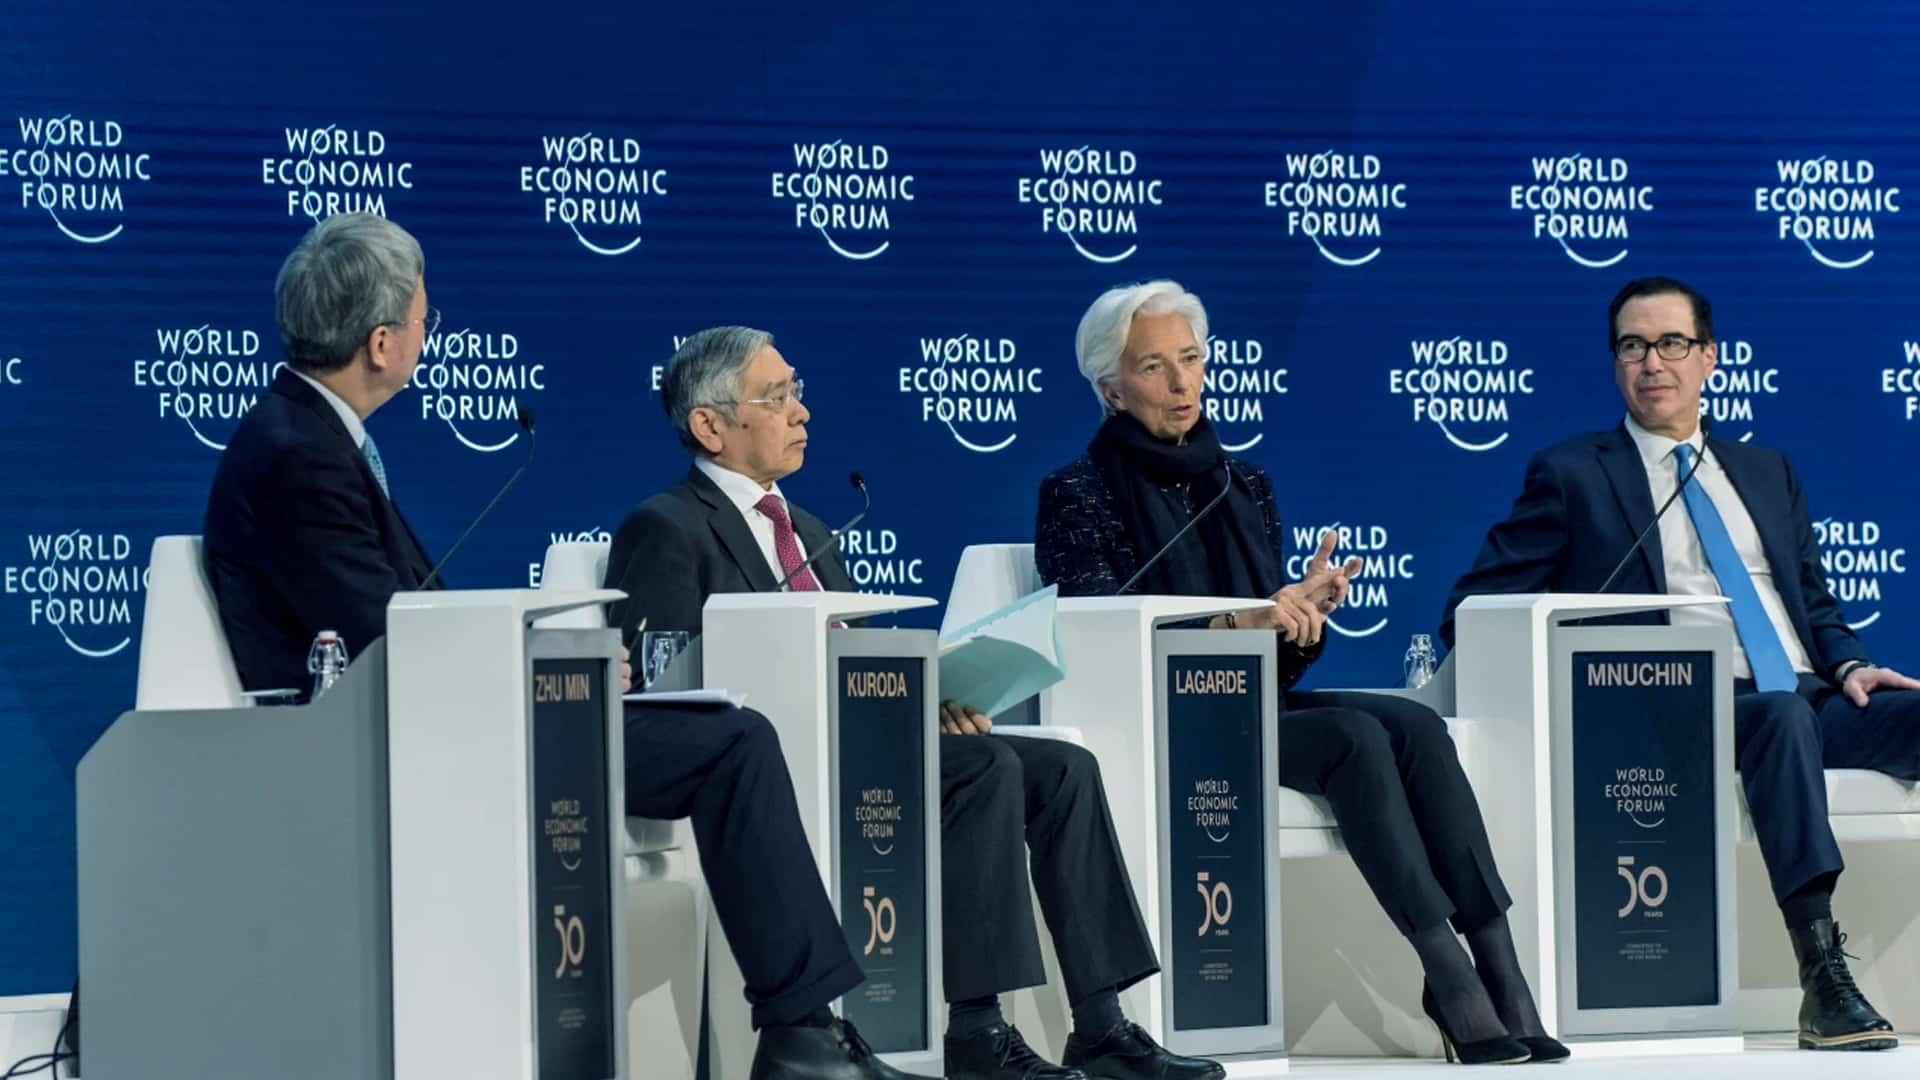 Tomar, Gadkari, Irani to participate in online Davos Agenda summit